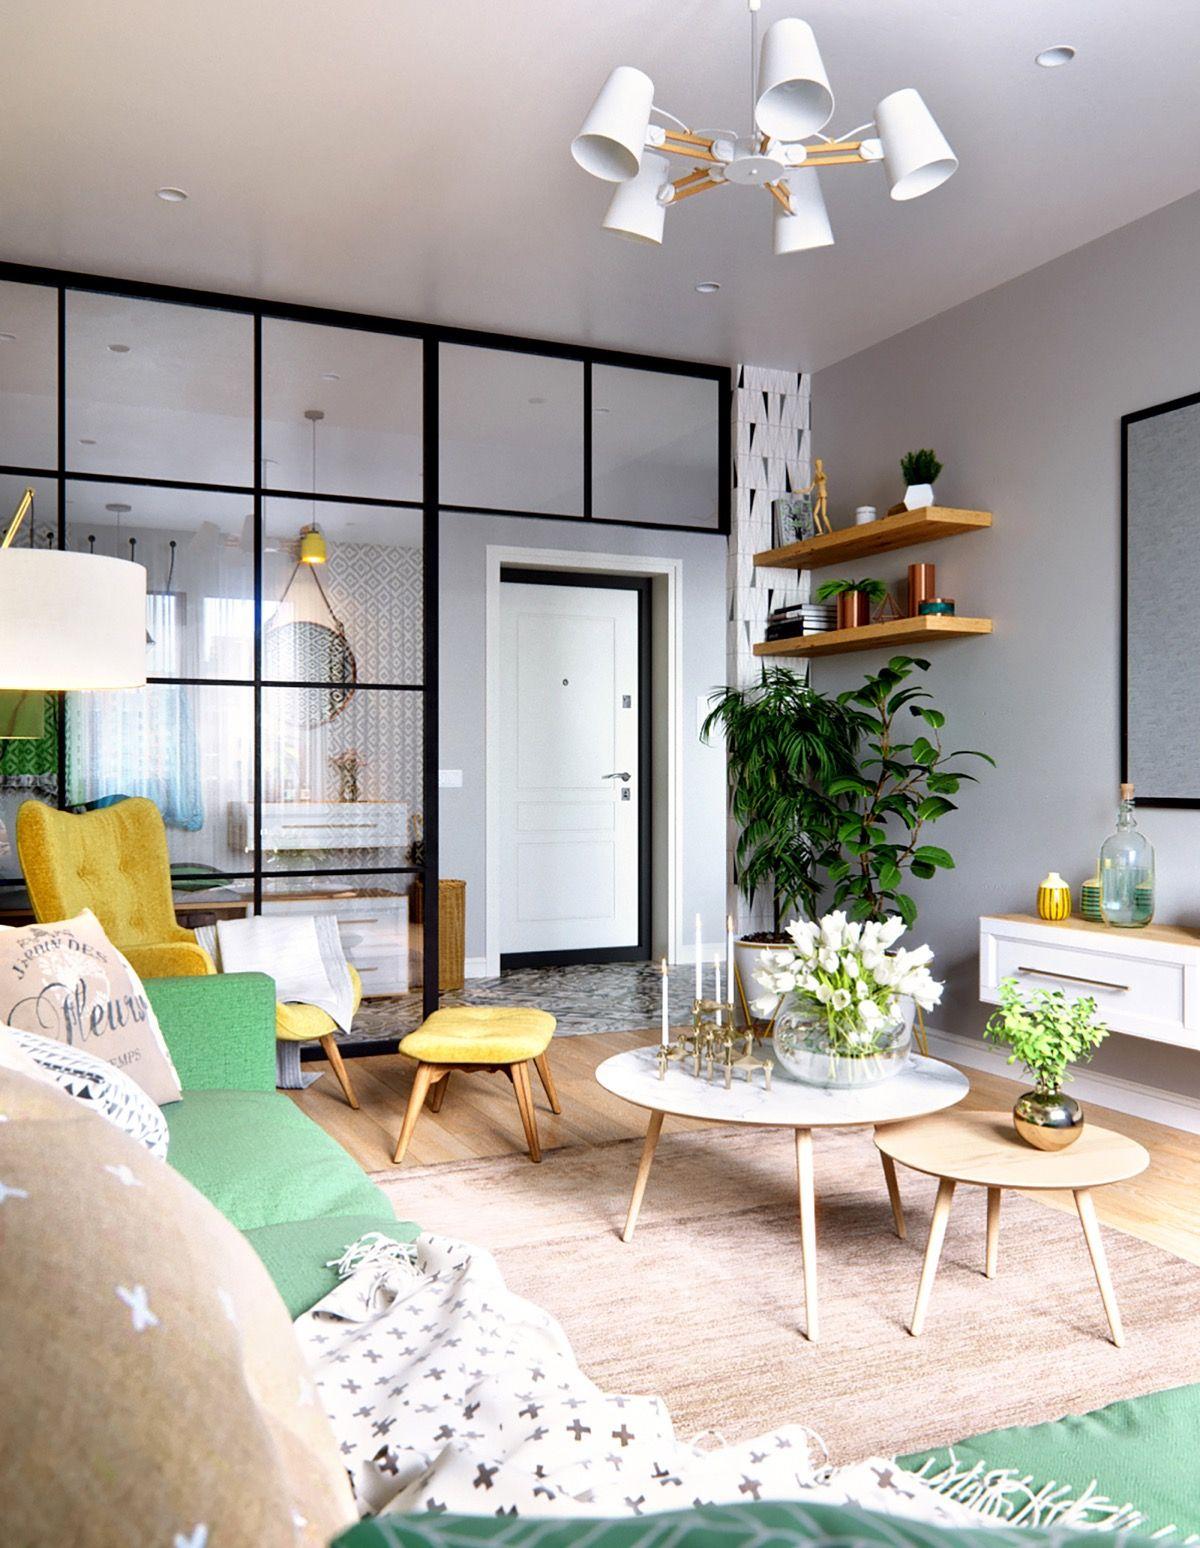 If you thought Scandinavian home design was